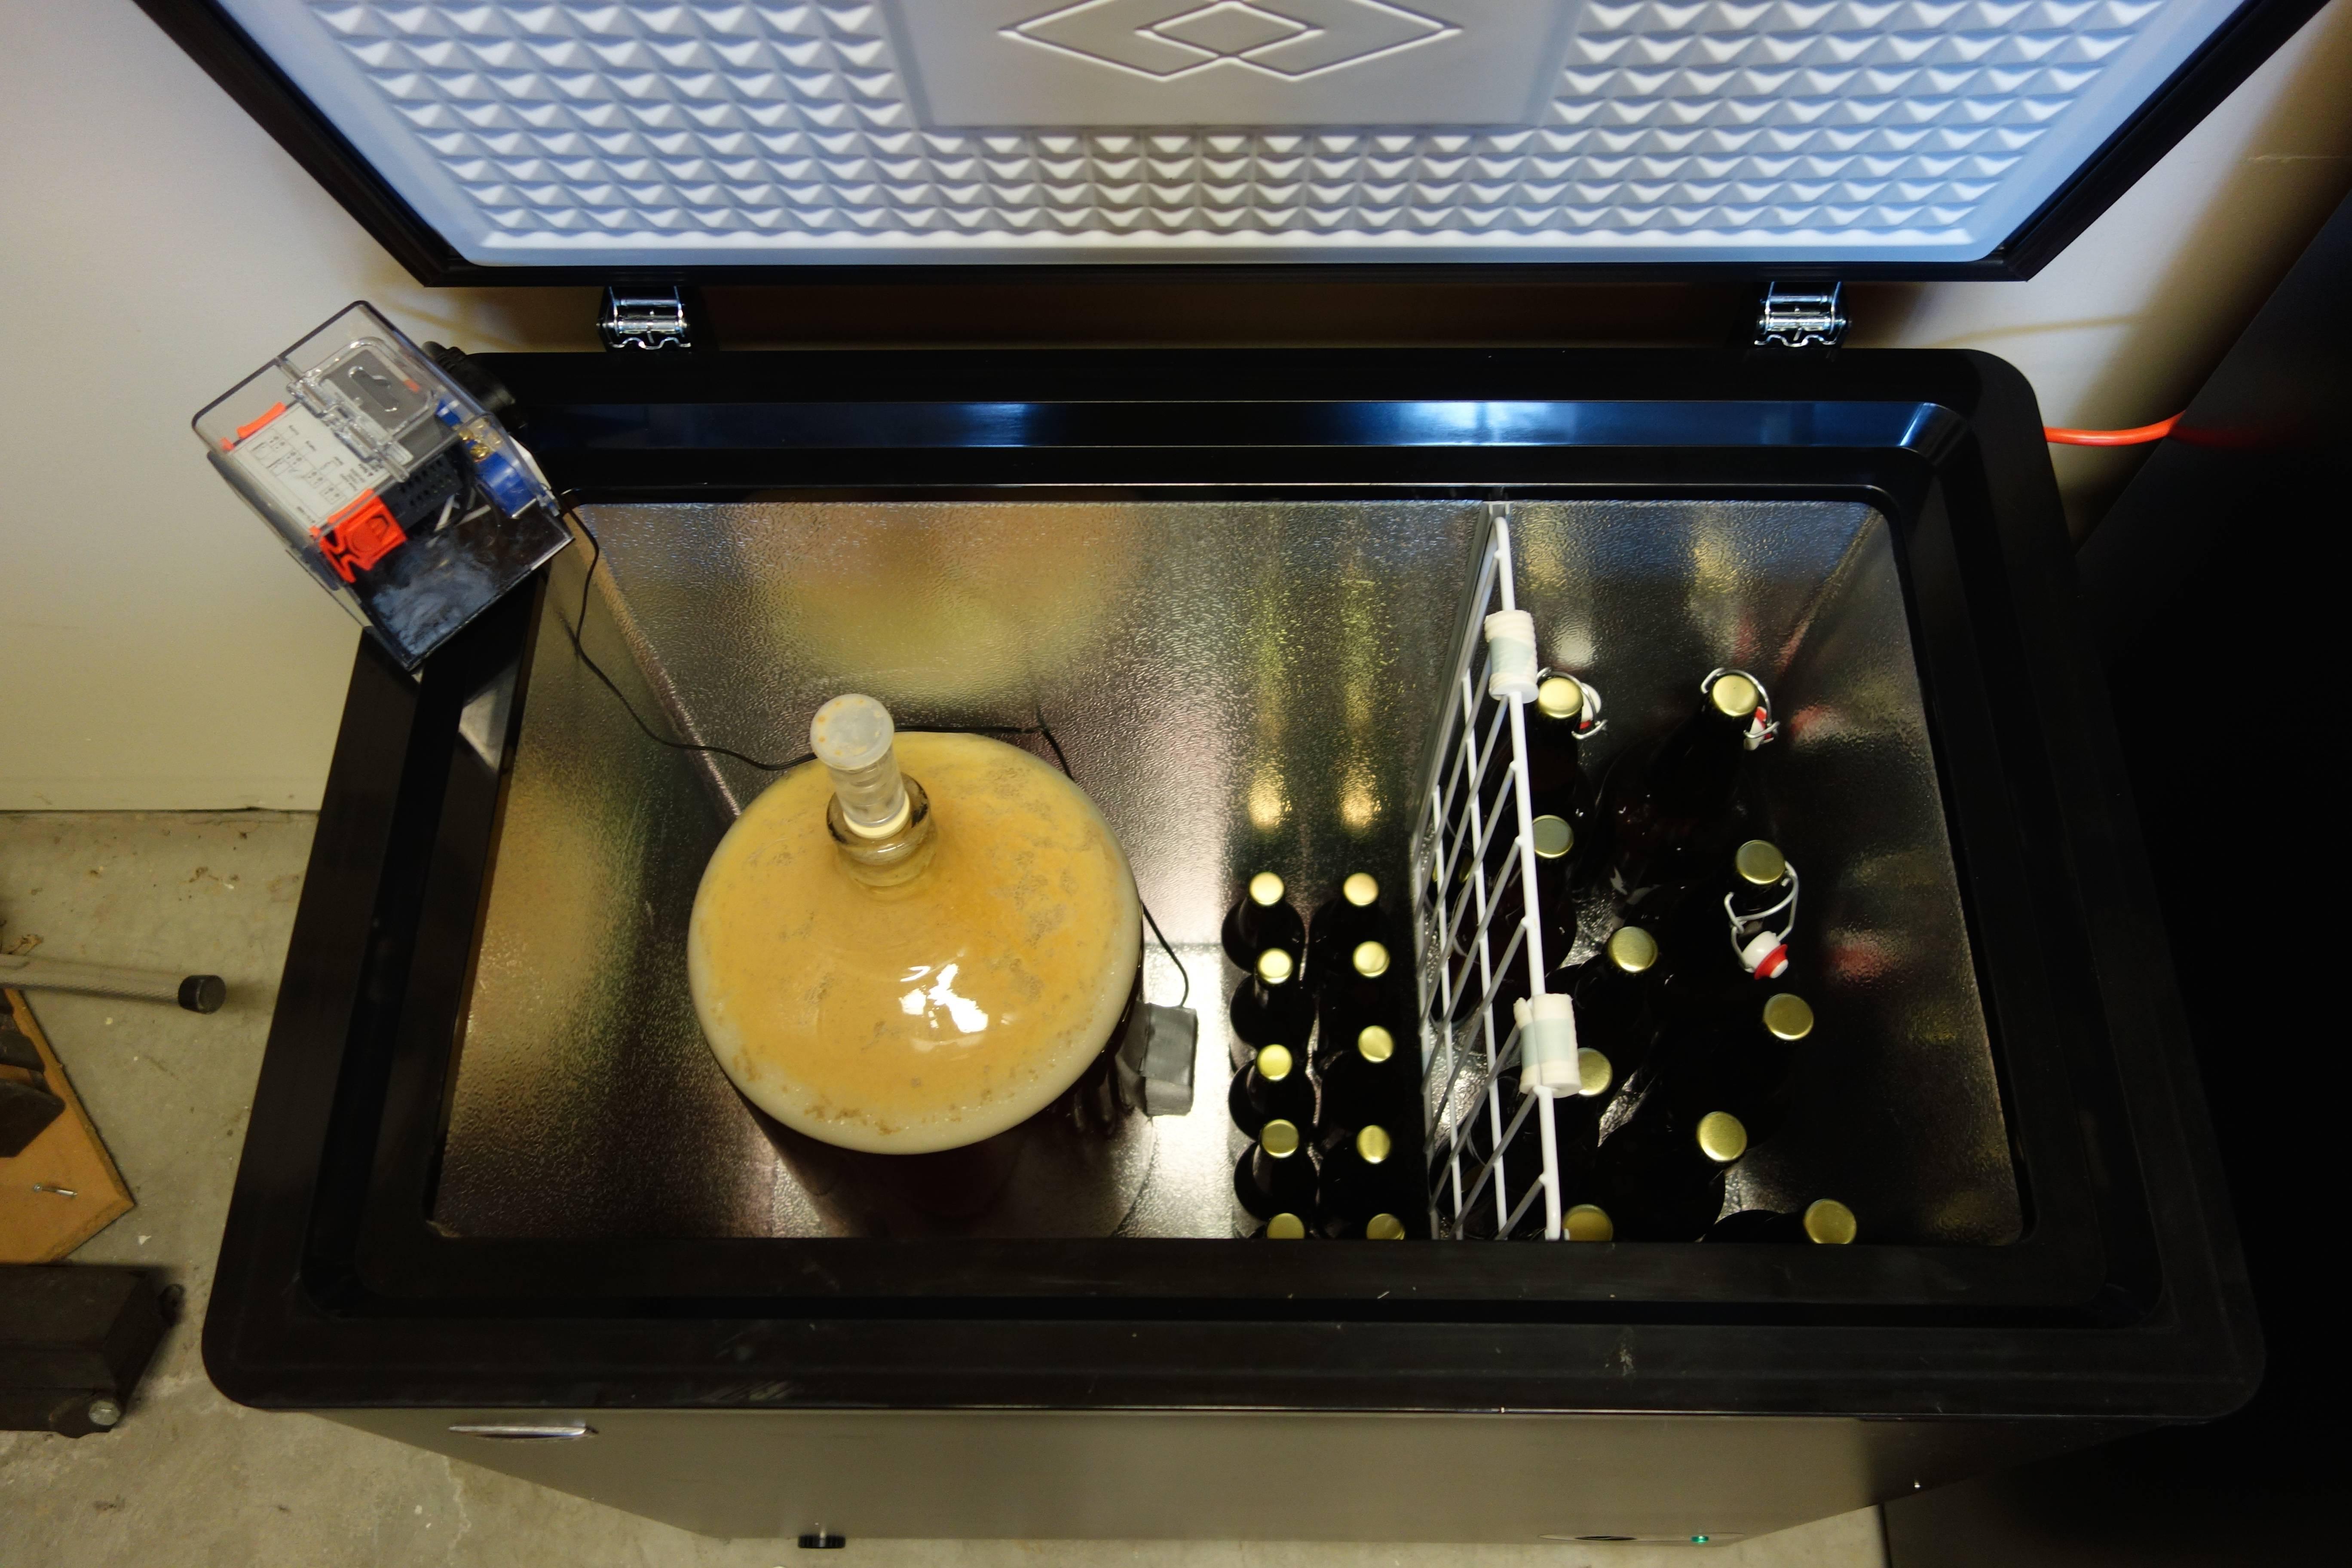 STC-1000 Fermentation Chamber Build   DIY   My Website on